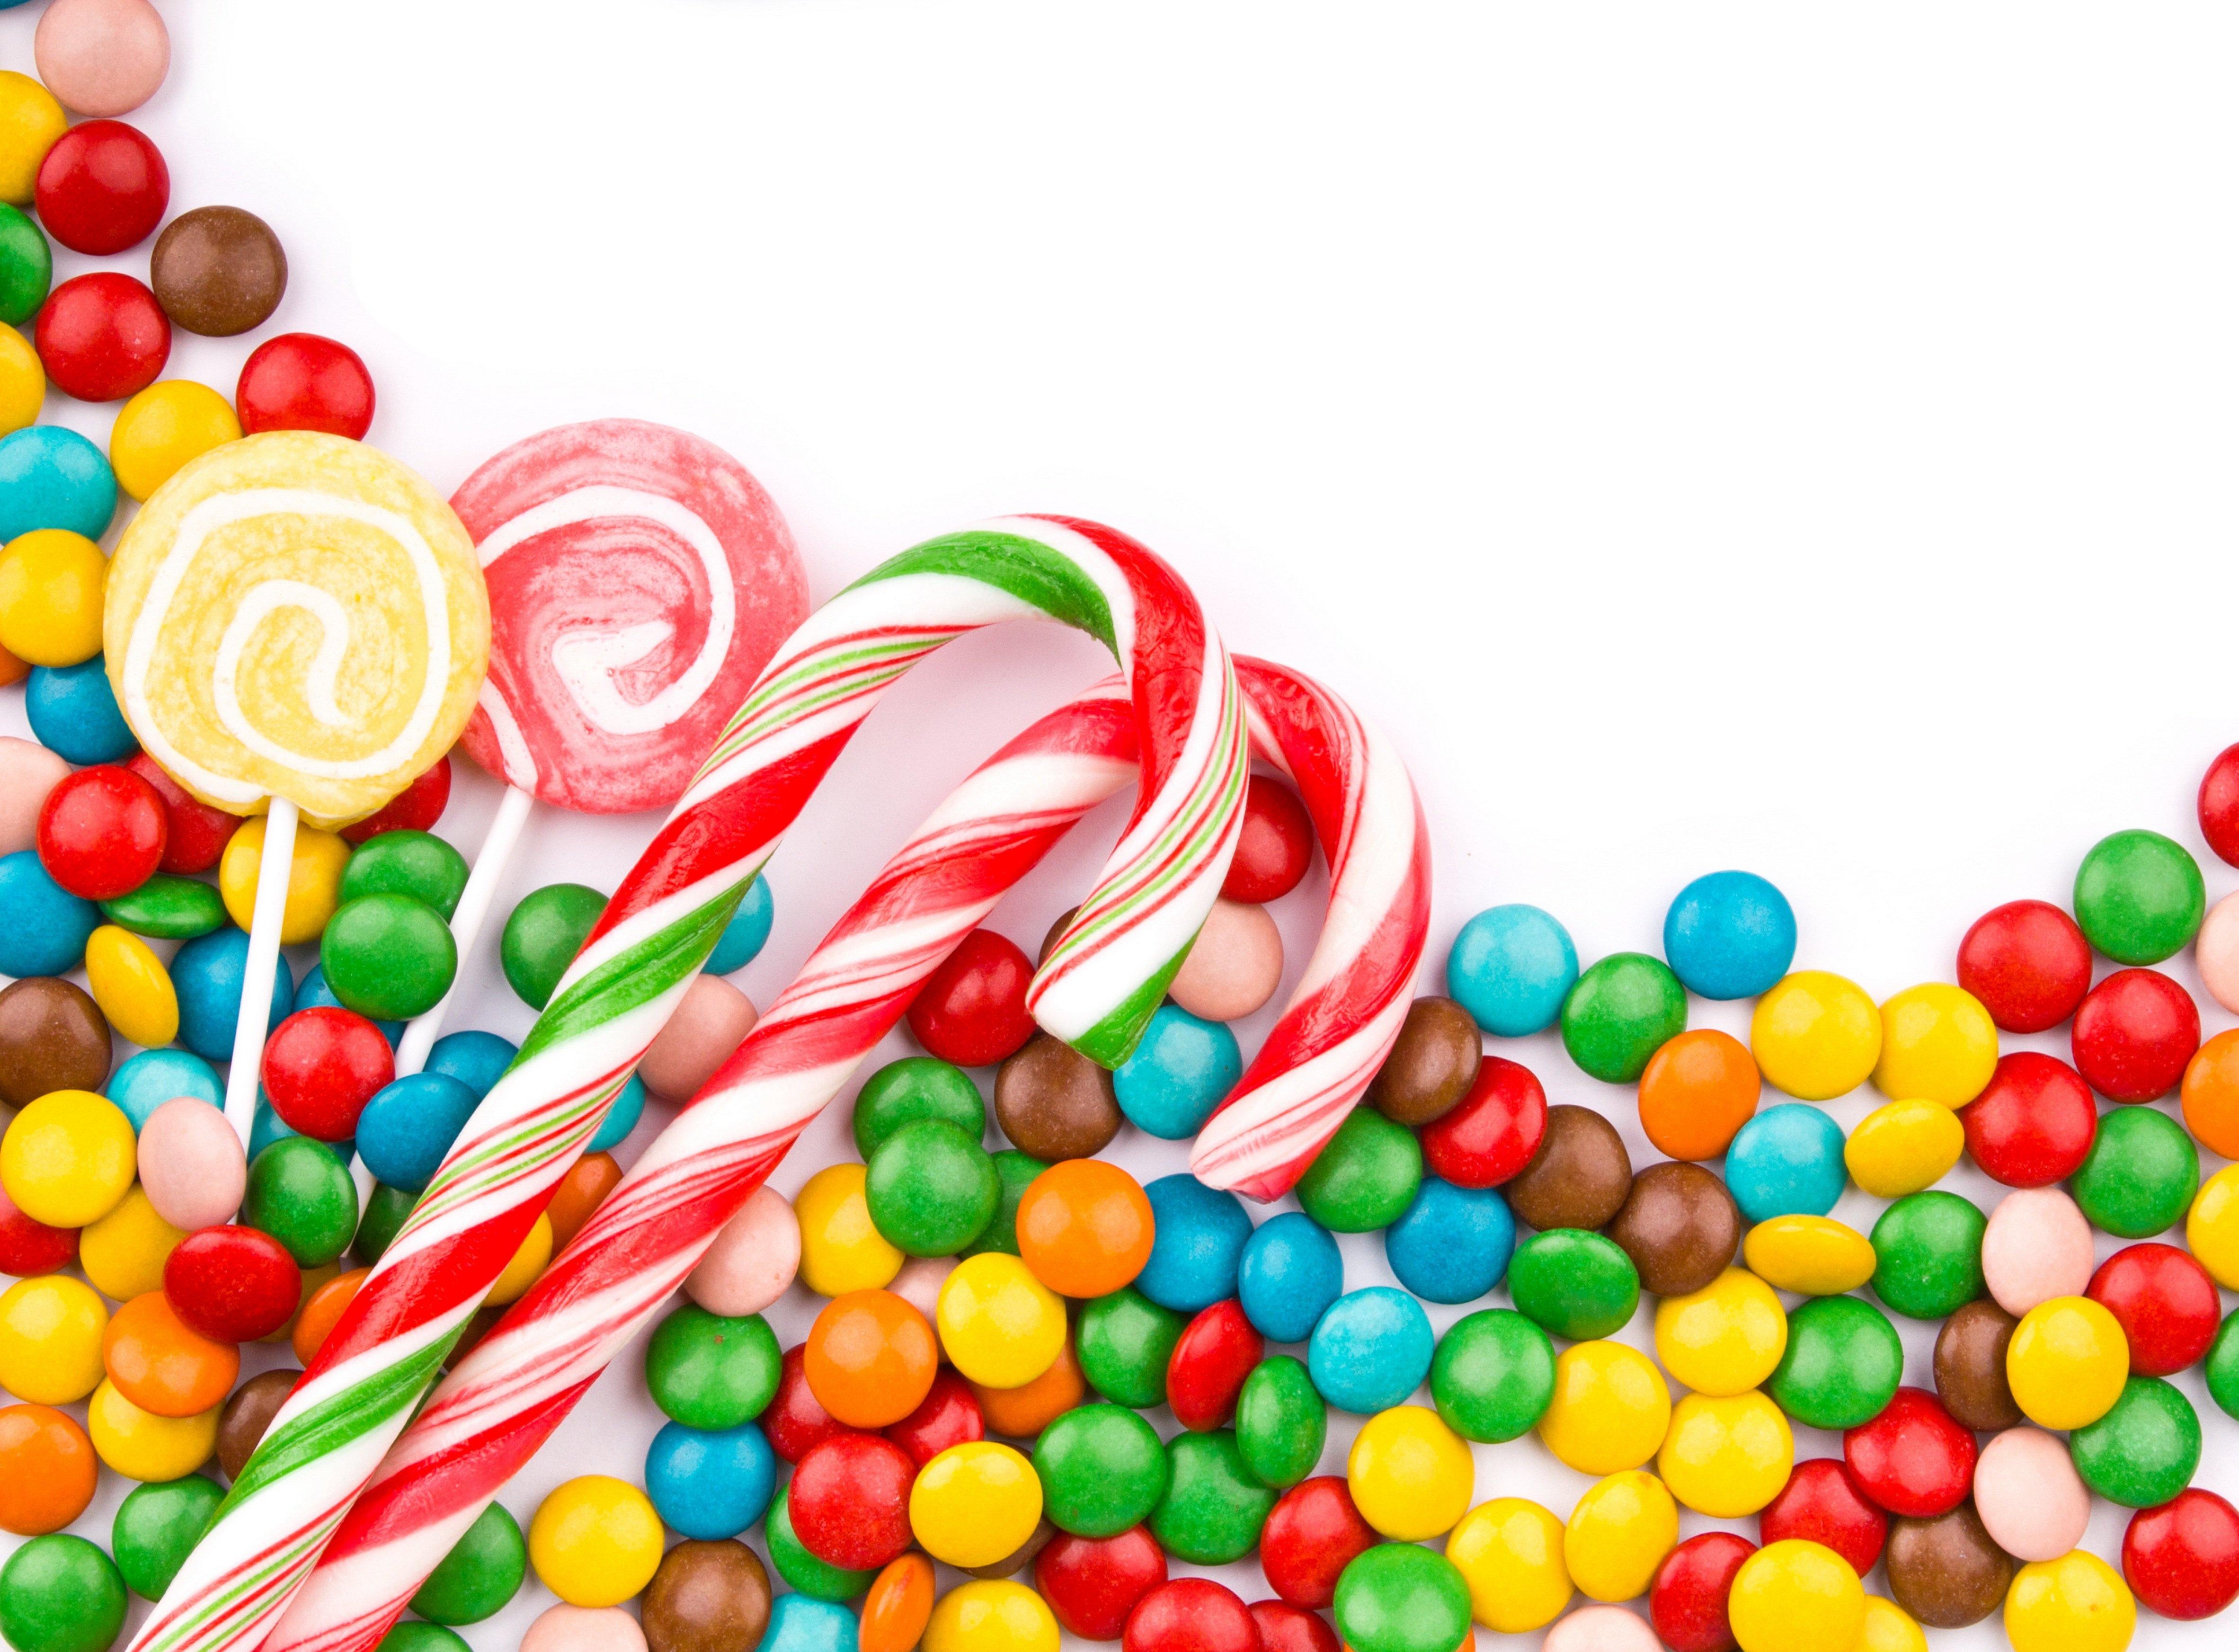 dessert sweets sugar meal food wallpaper 4730x3490